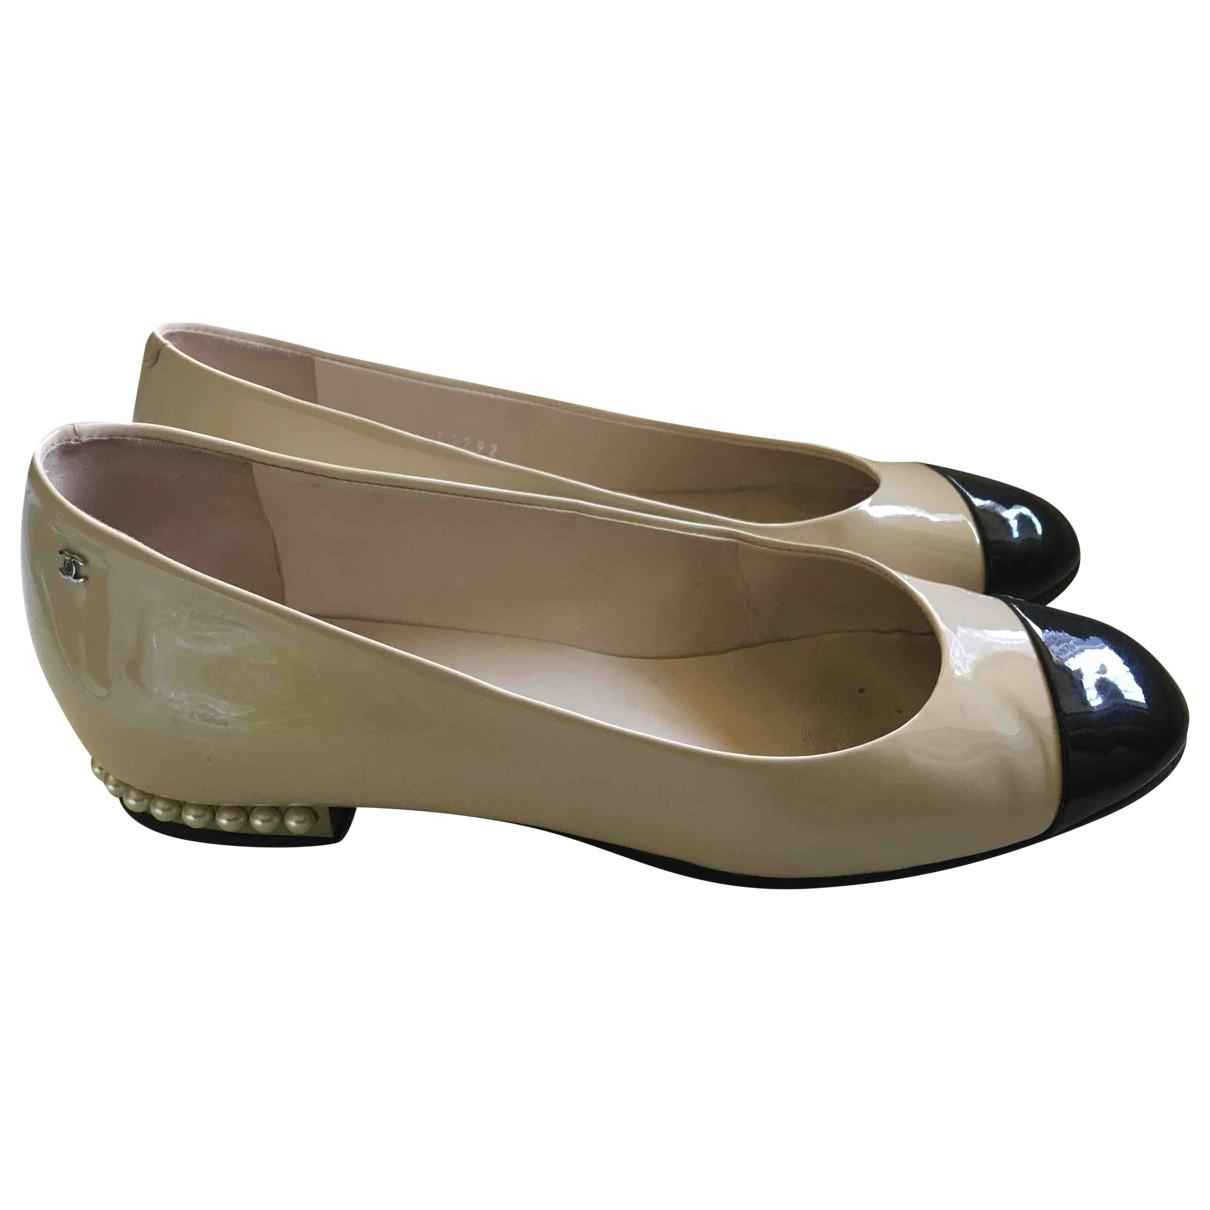 Chanel \N Ecru Patent leather Ballet flats for Women 36 EU